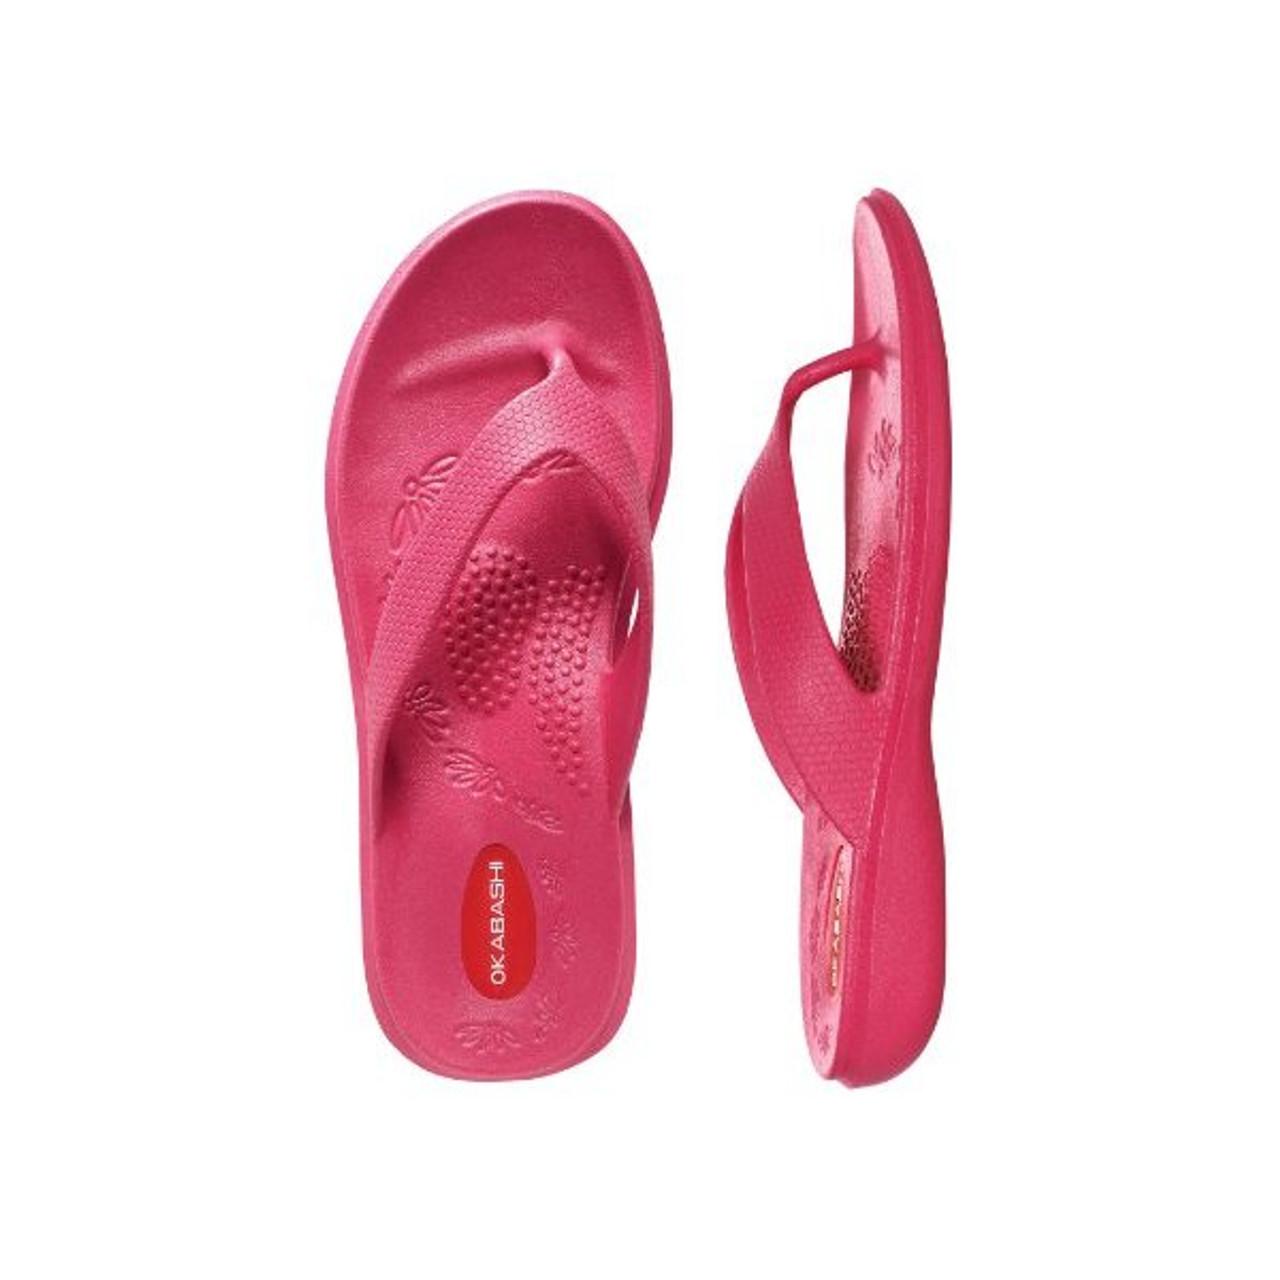 98136c27982e Okabashi Kid s Classic Flip Flop